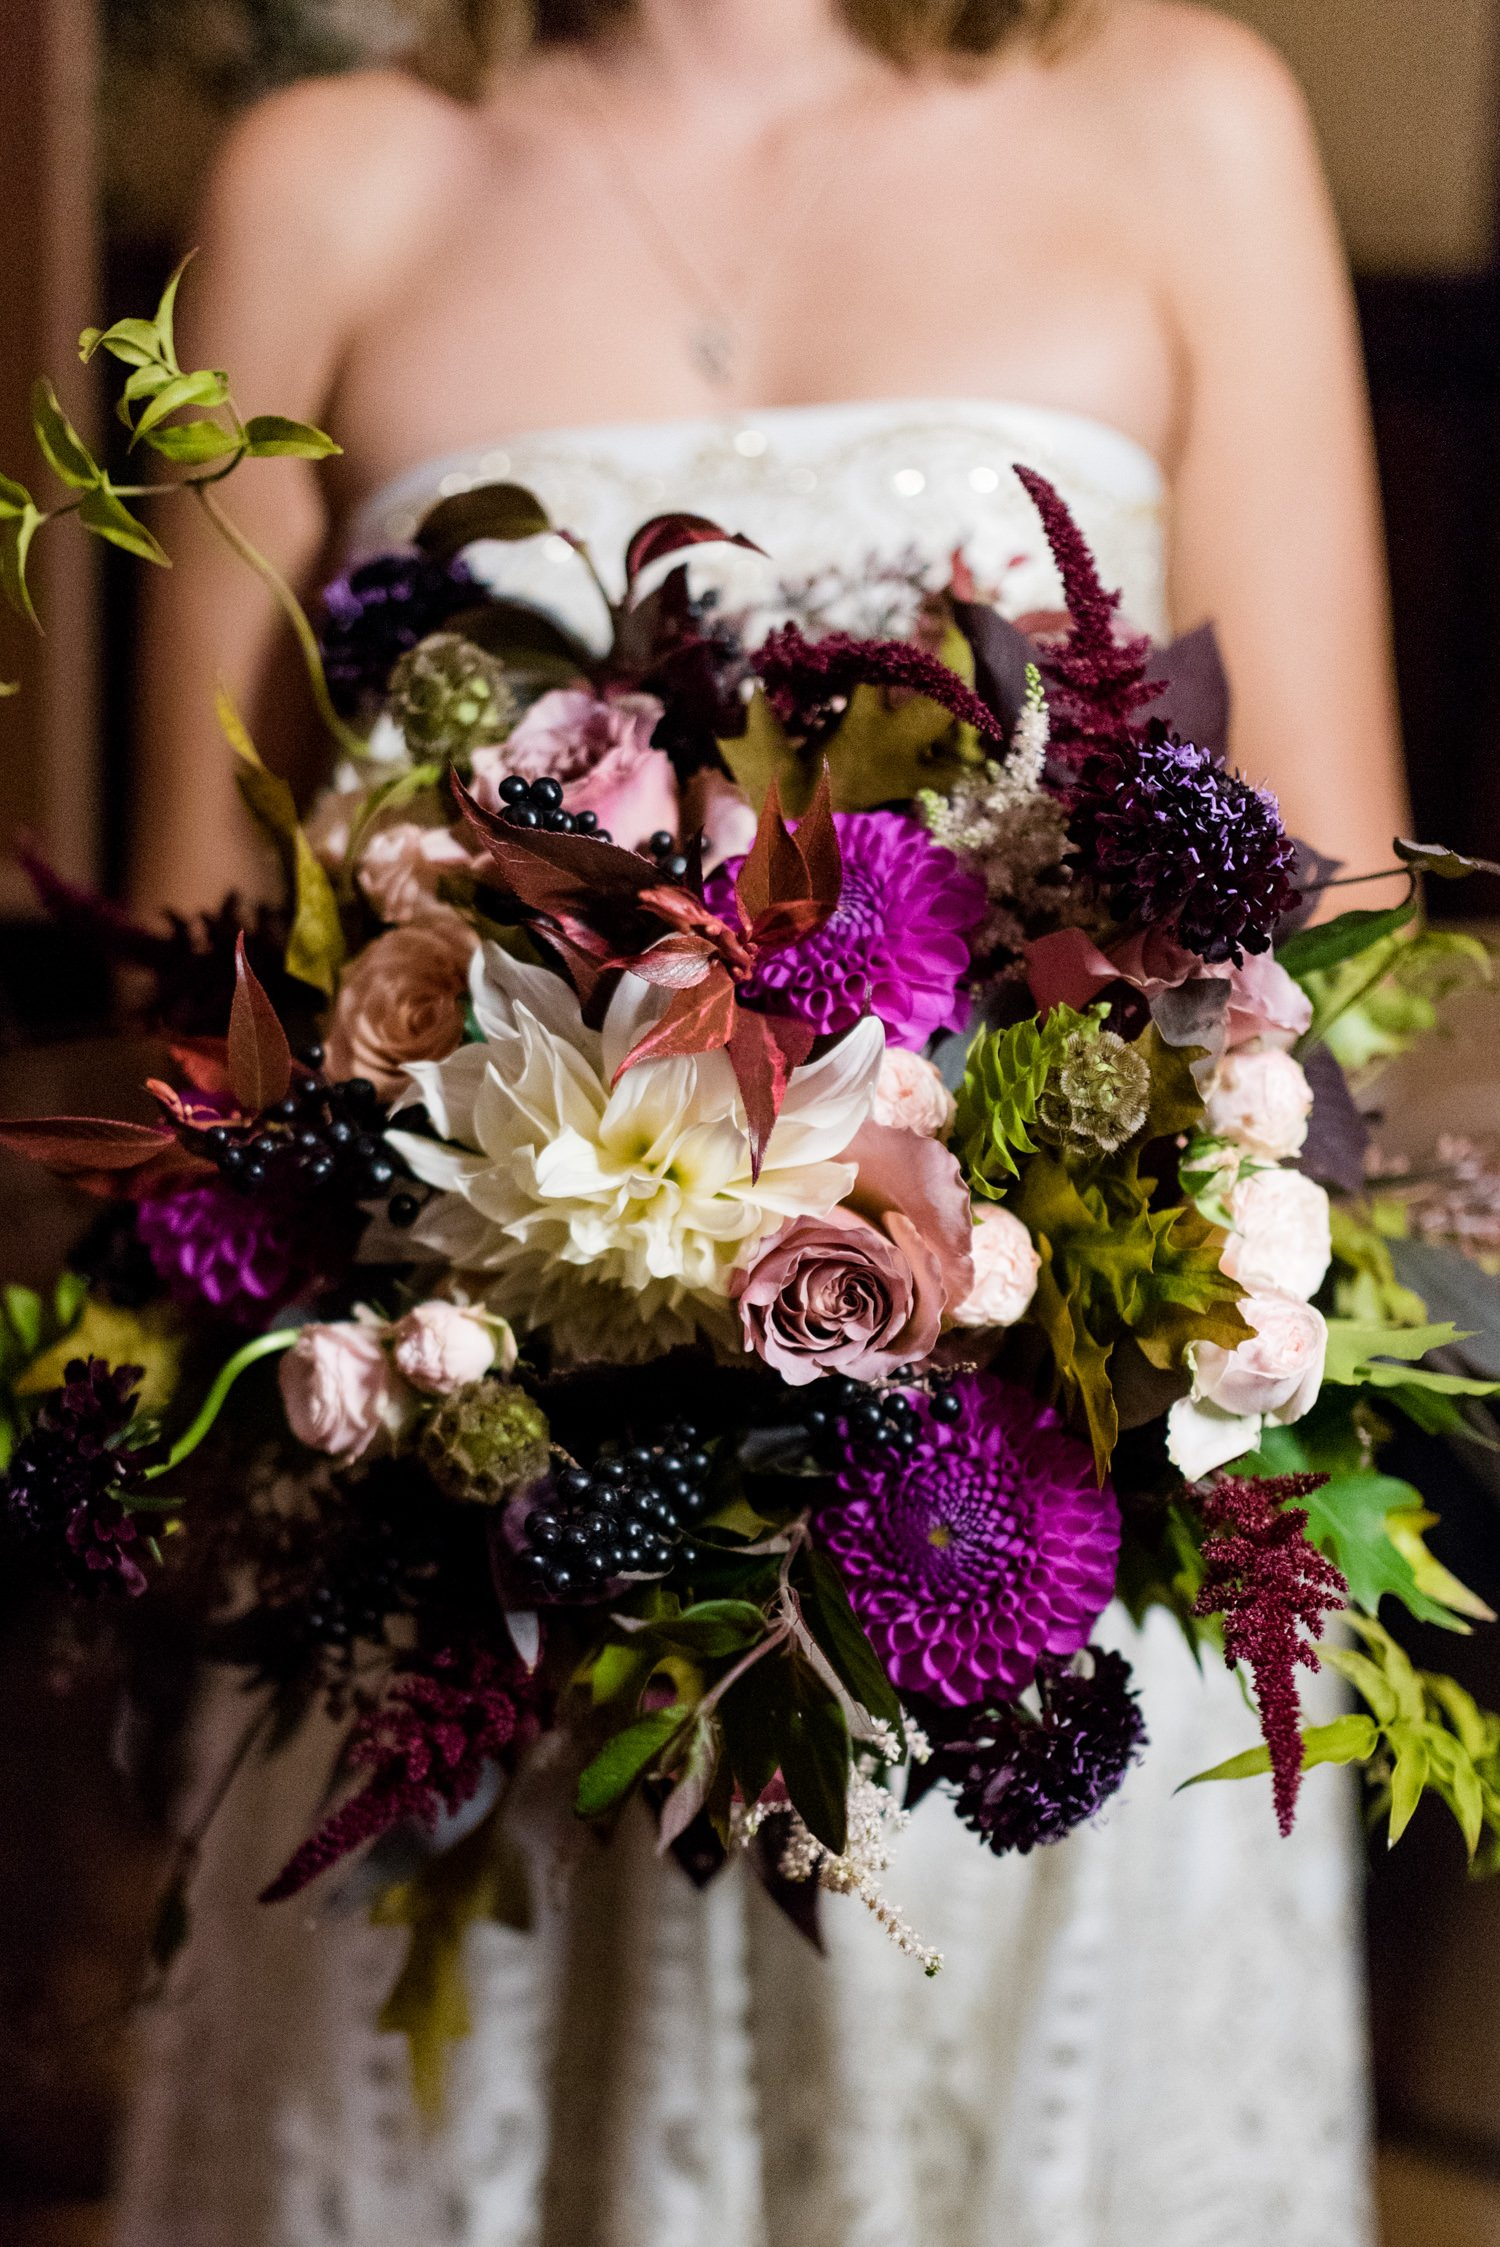 Beautiful Flowers by Passion bridal bouquet Bath for a Roman Baths Wedding Photographer